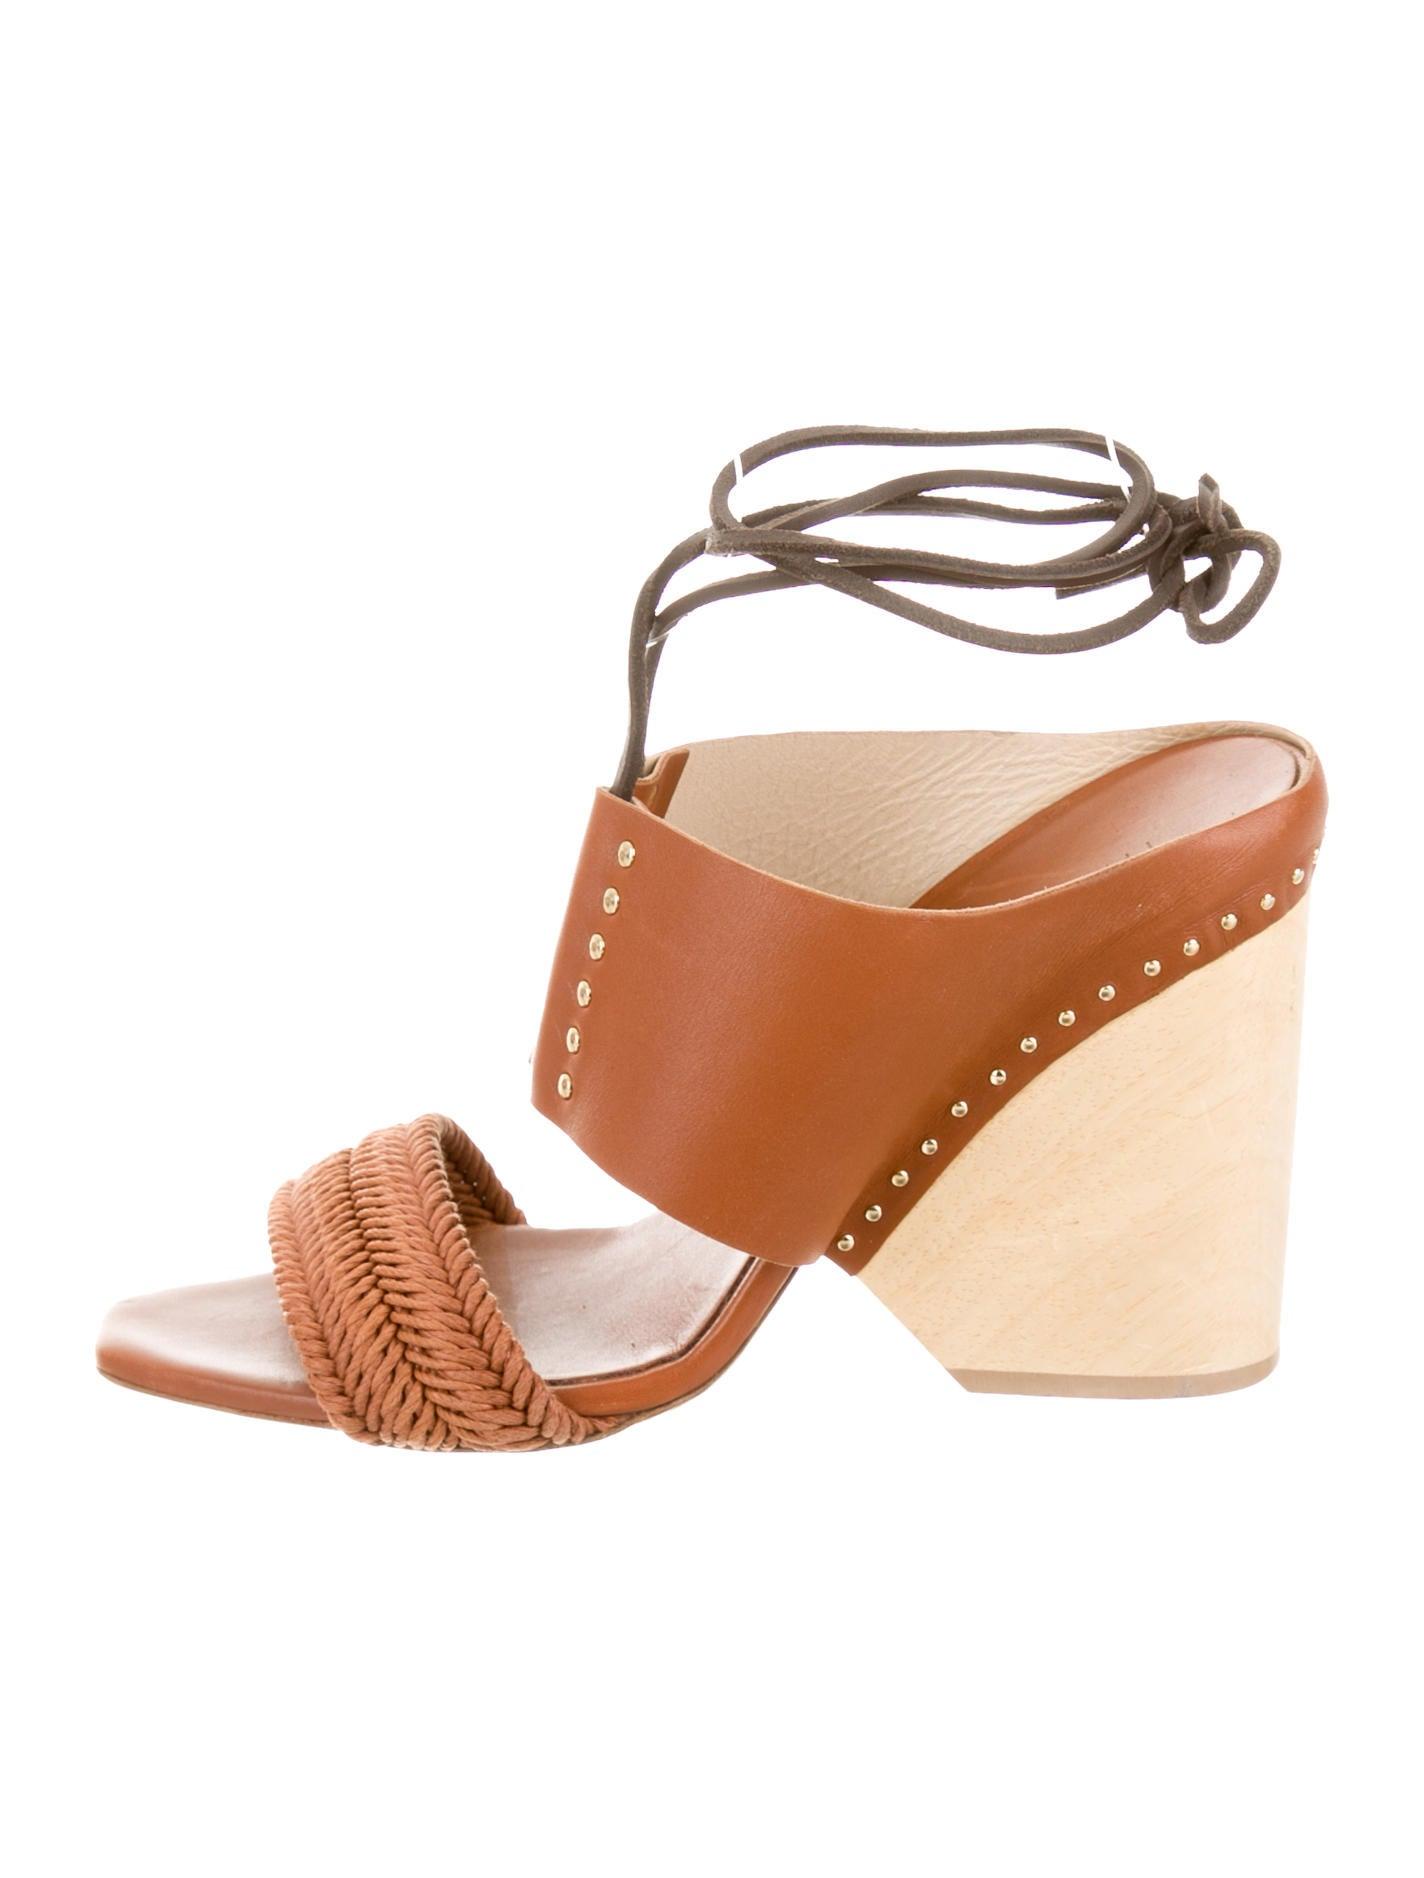 Thakoon Shoes Sale